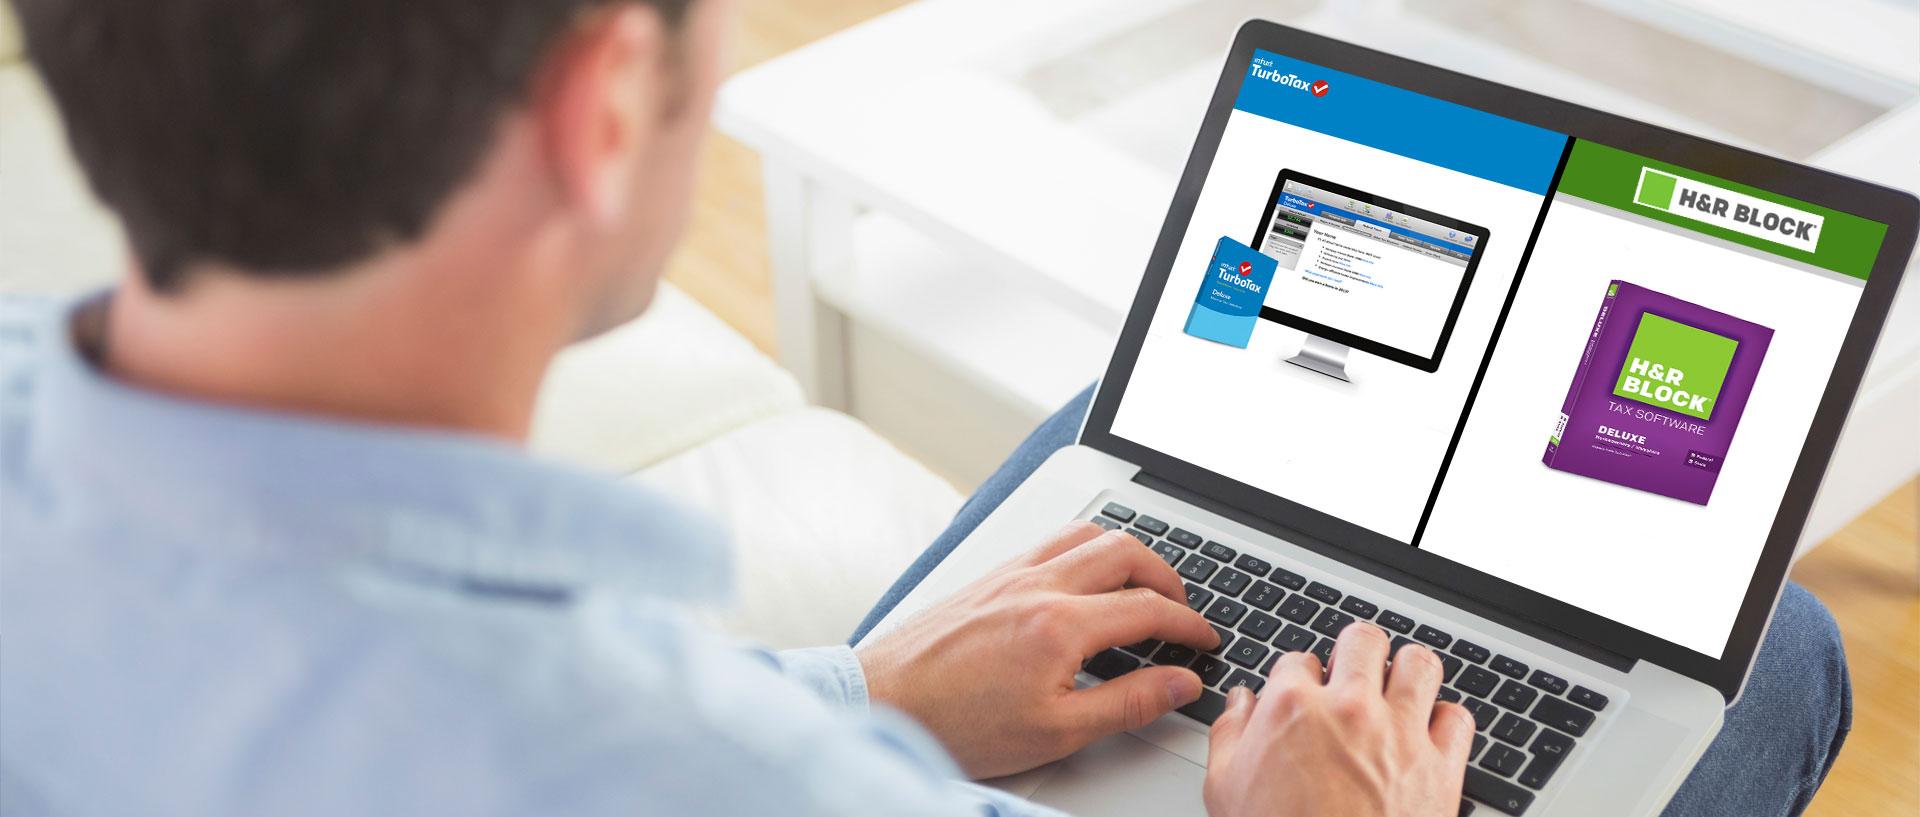 Tax Preparation Software: H&R Block Deluxe vs. TurboTax Deluxe #0880C4